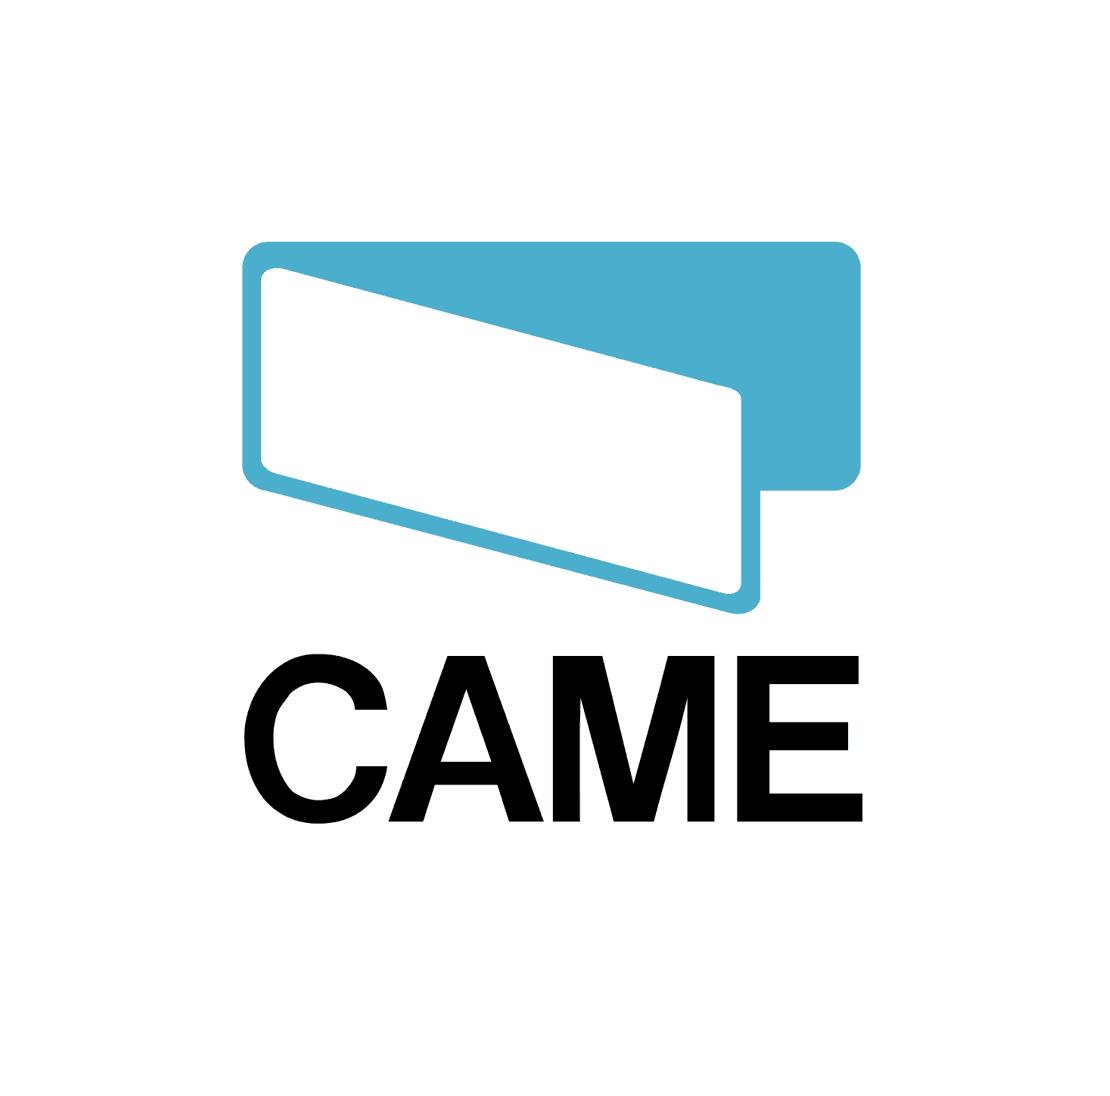 aumatismi CAME trento